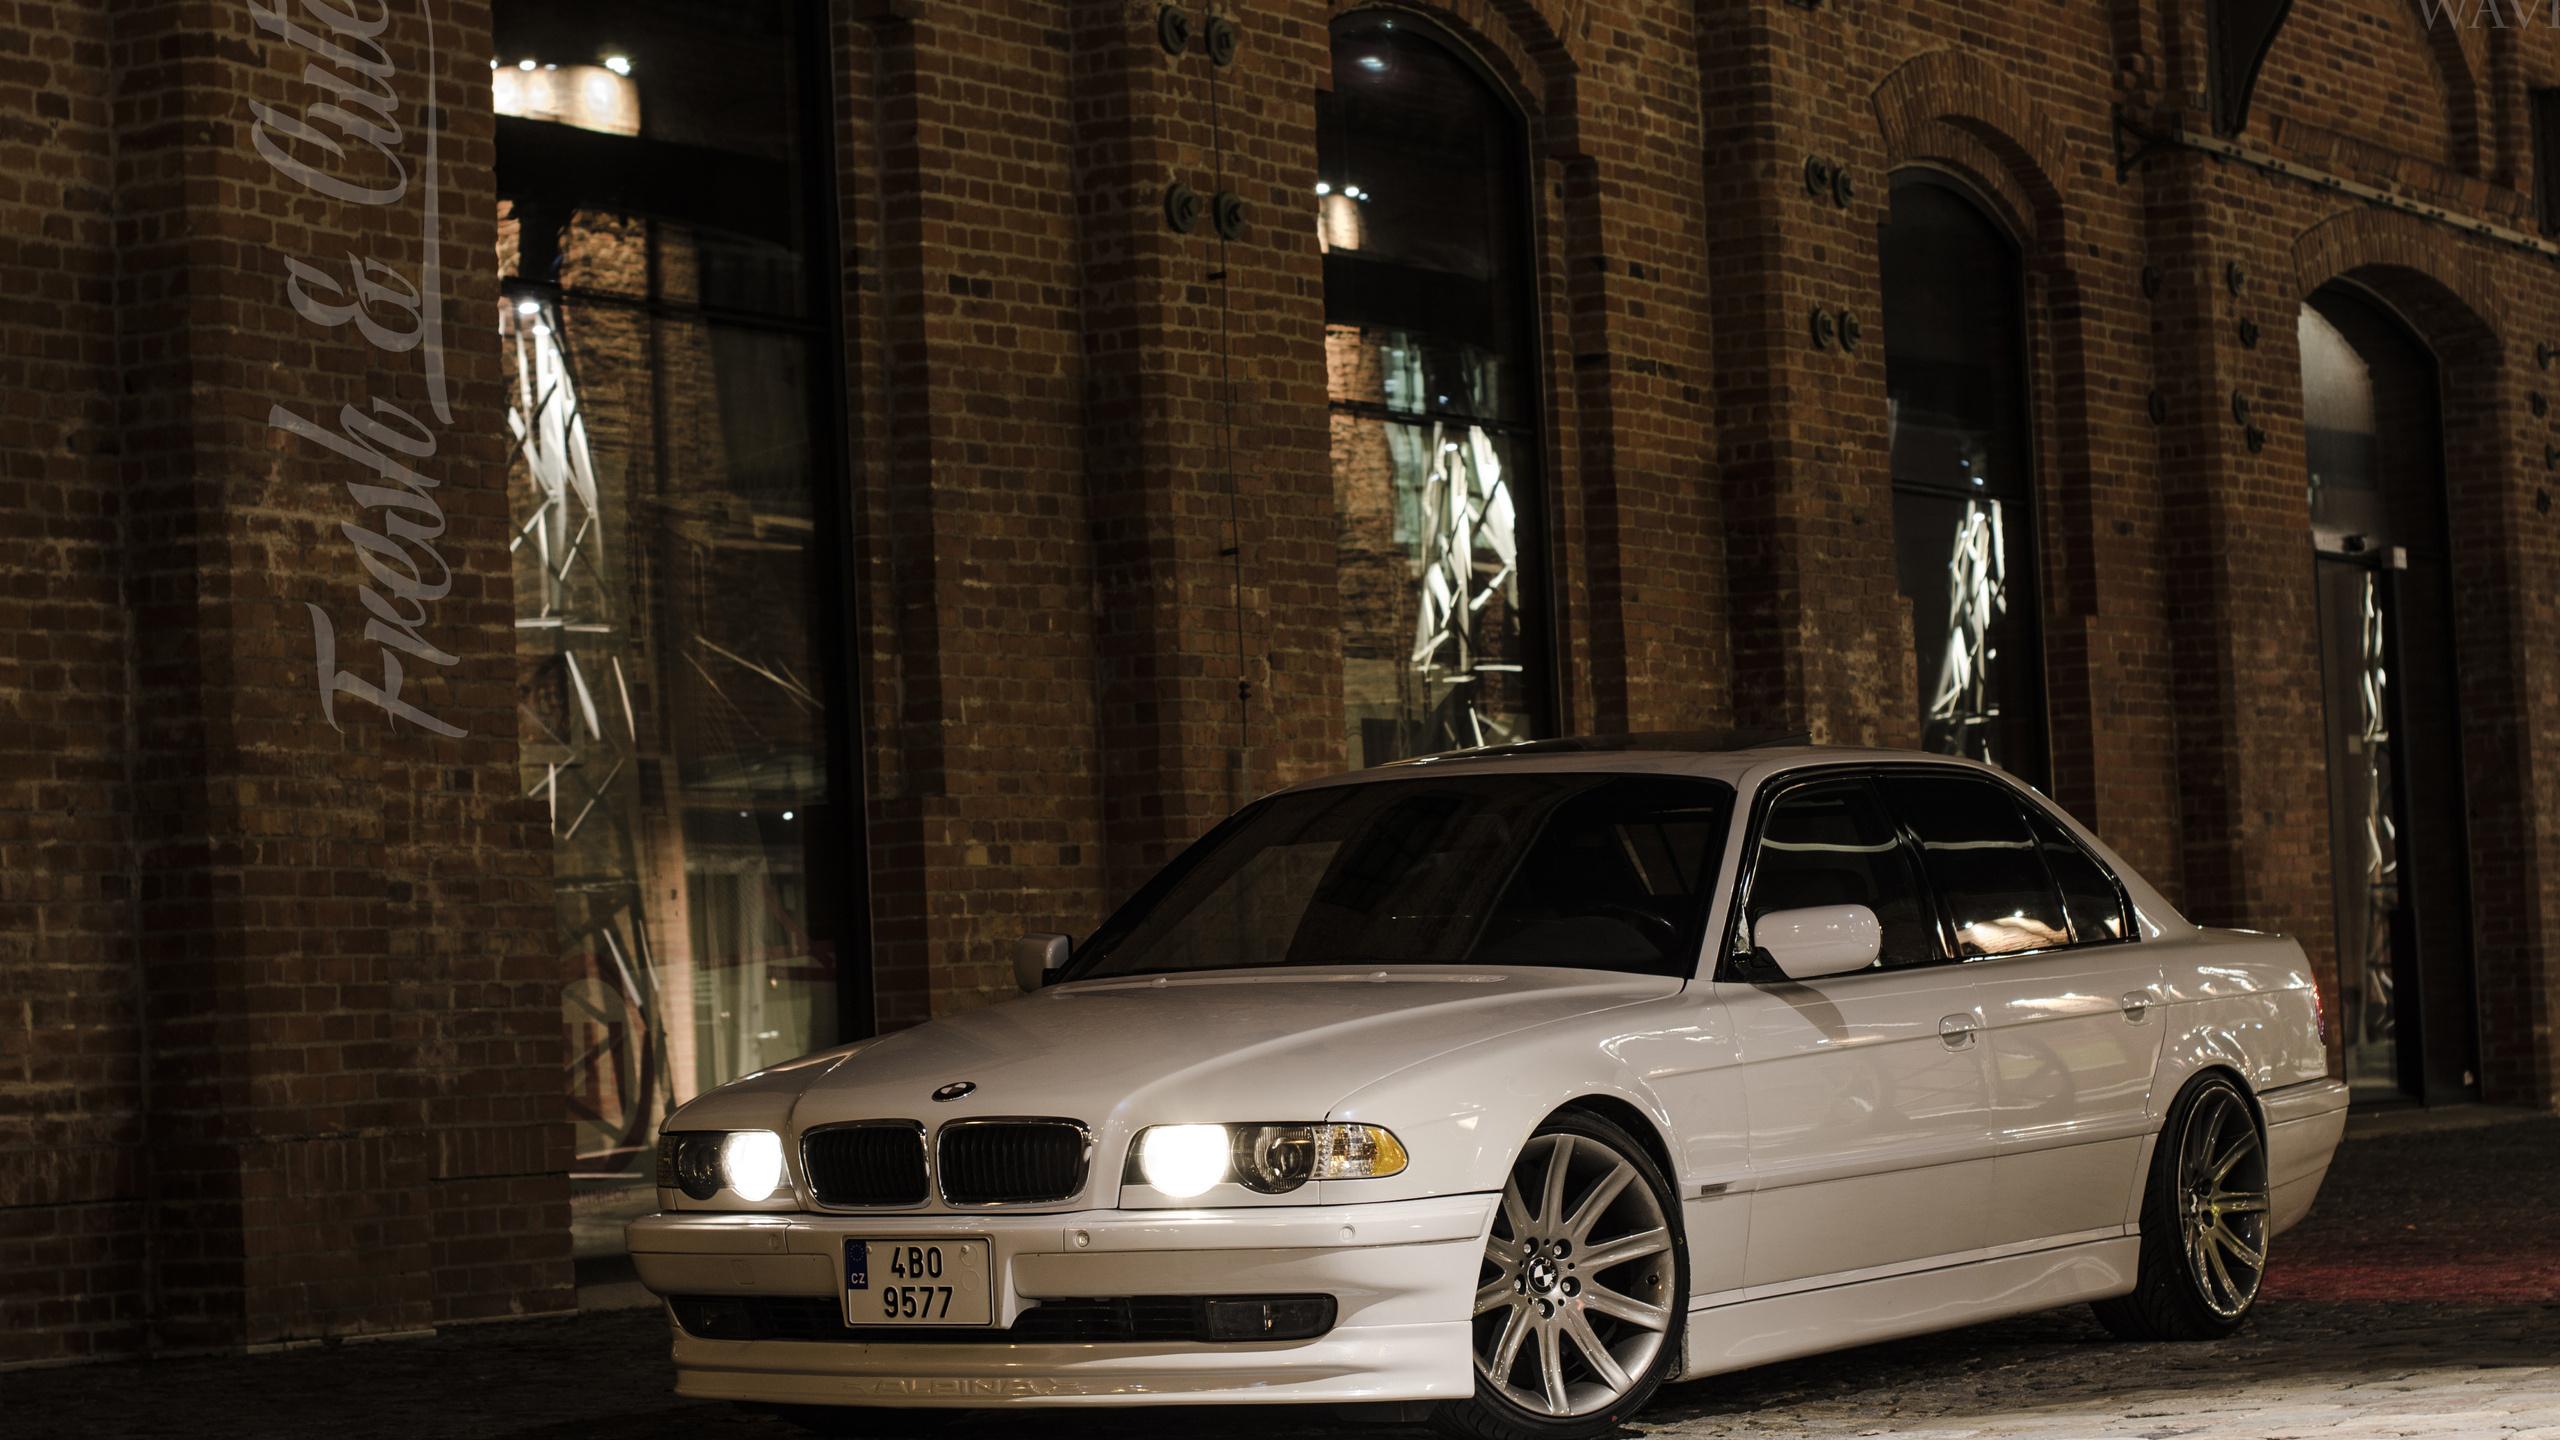 e38, белый, bmw 740, bumer, семёрка, бумер